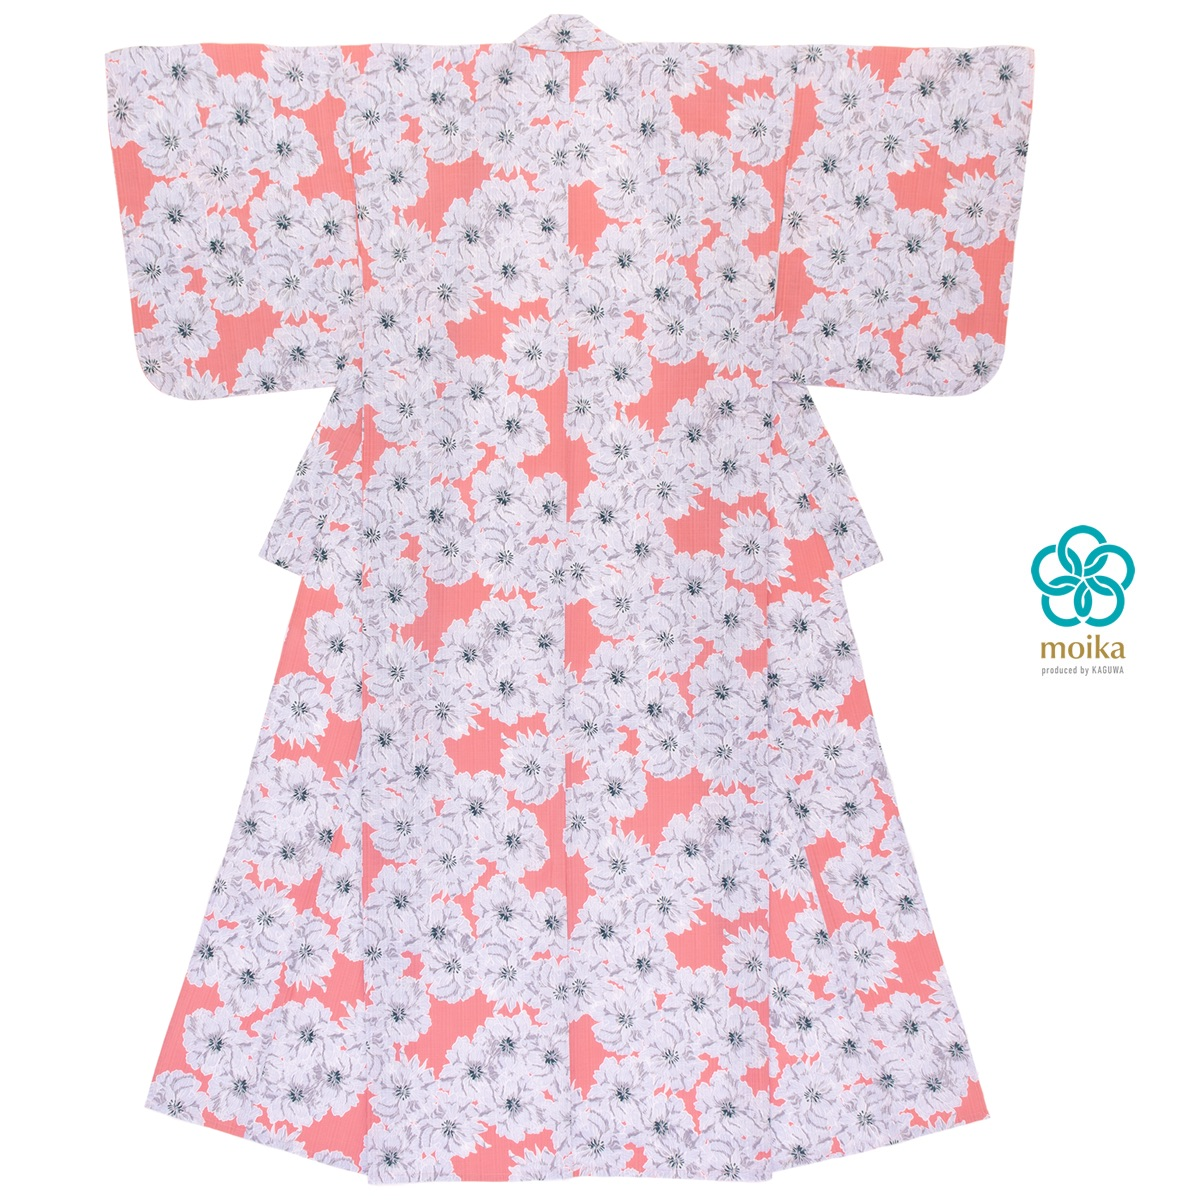 moika 浴衣 レディース 単品 Mサイズ レトロ サーモンピンク 芍薬 花 フラワー 衿芯付き 女性用 仕立て上がり